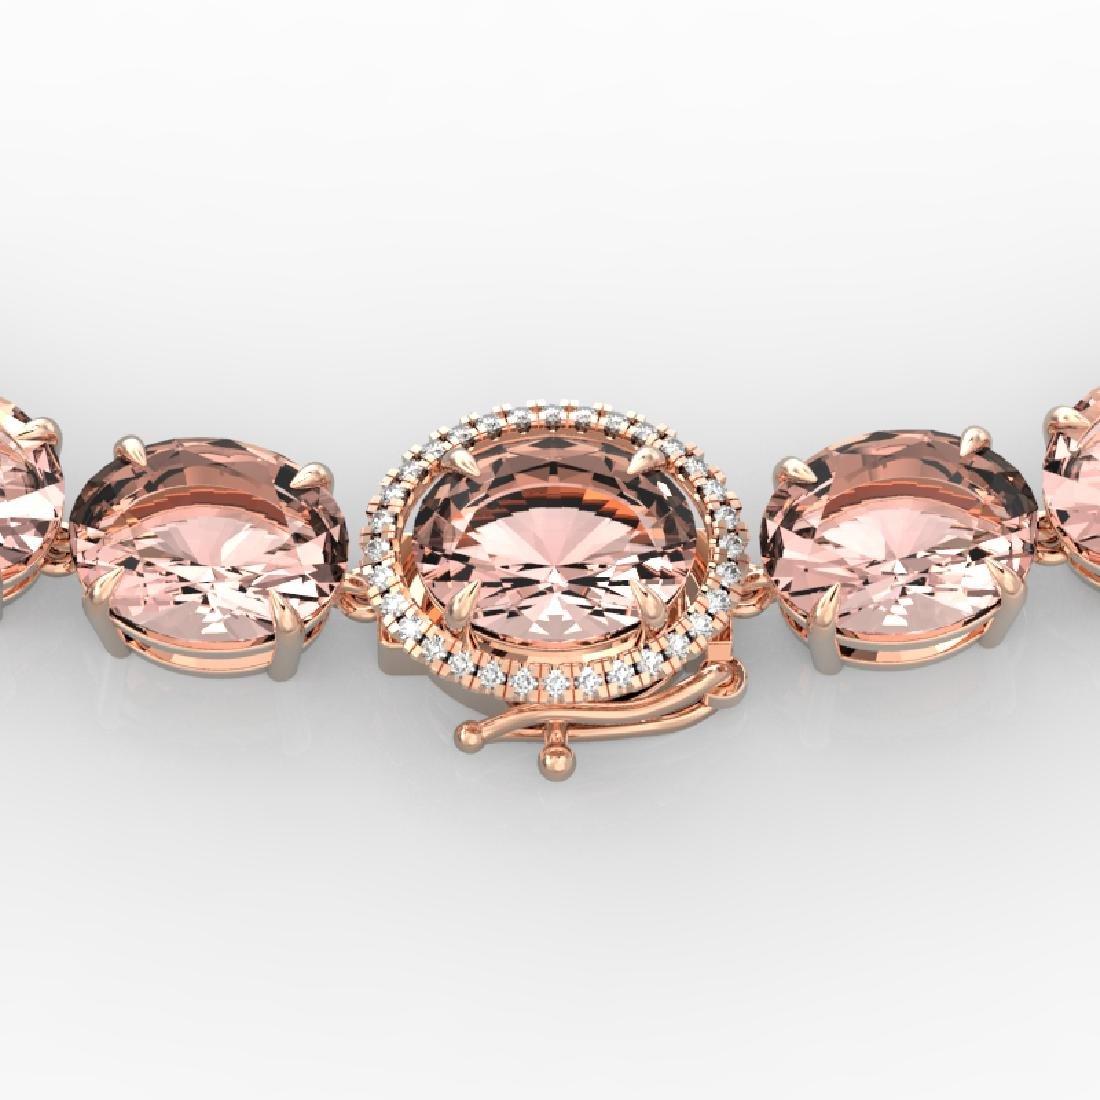 148 CTW Morganite & VS/SI Diamond Pave Necklace 14K